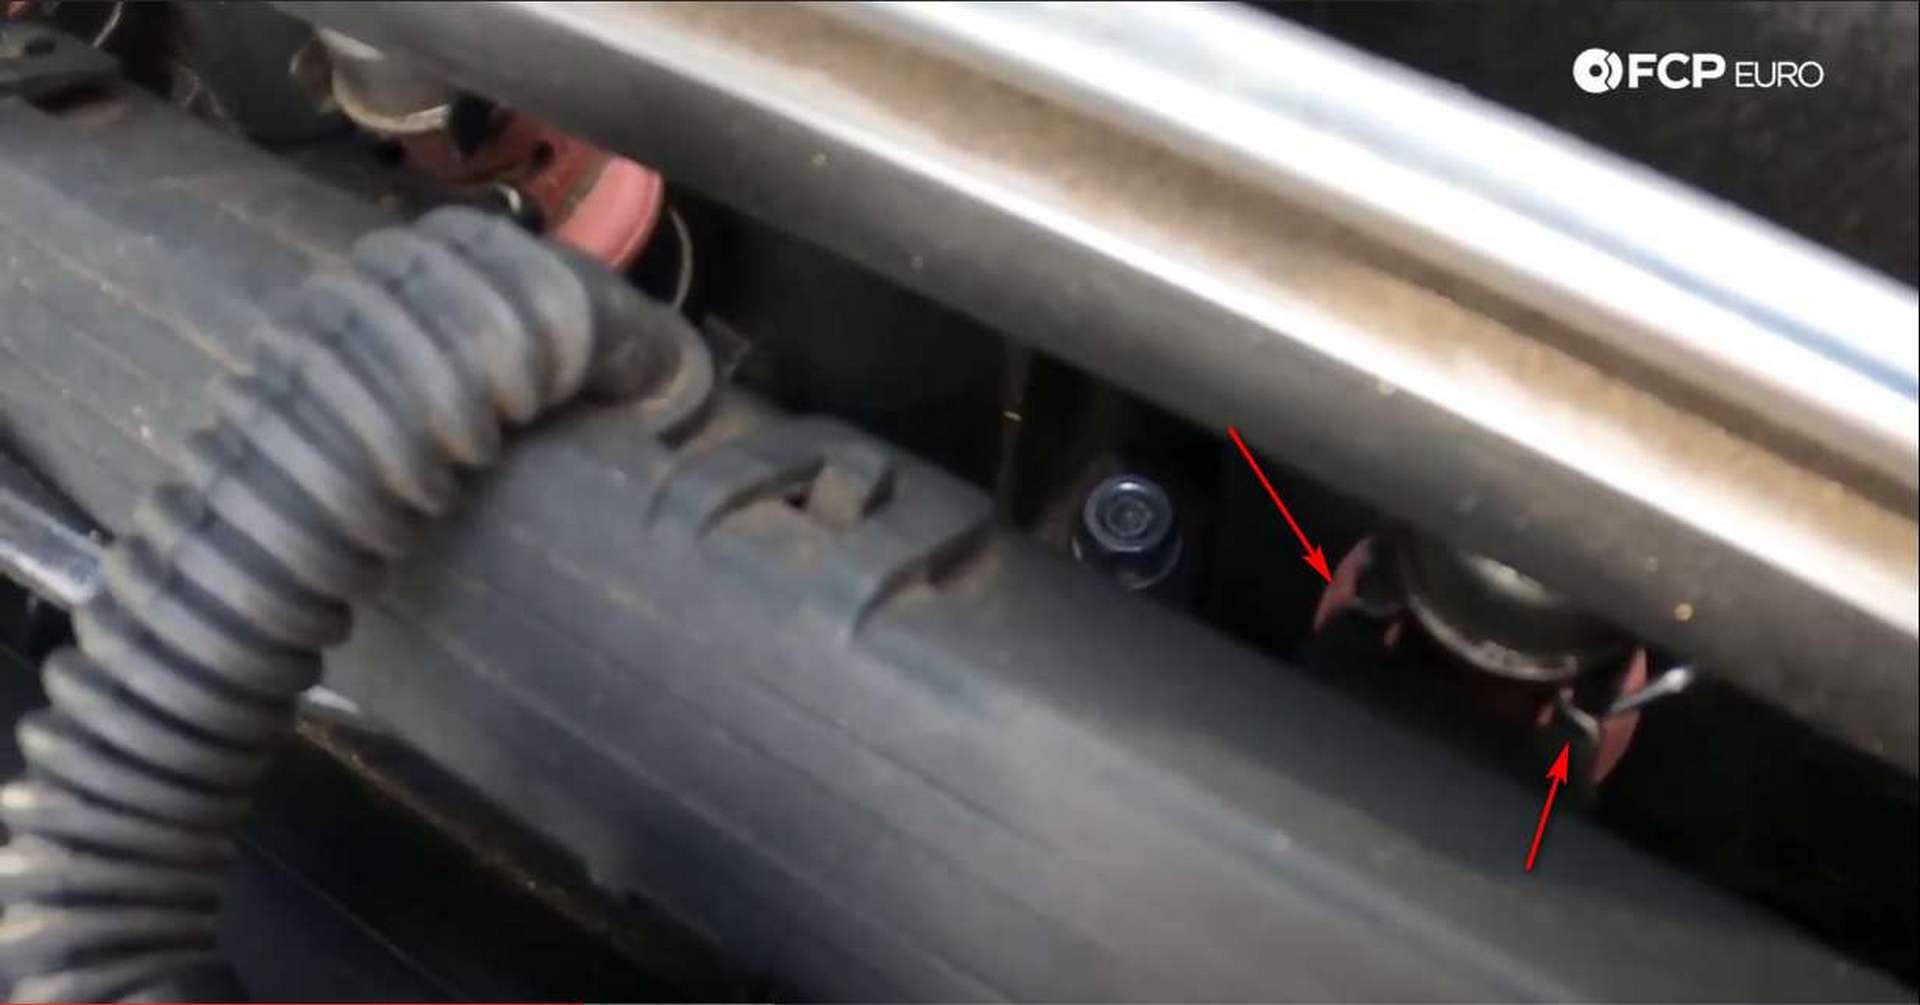 DIY BMW M50 Intake Manifold injector clip tips